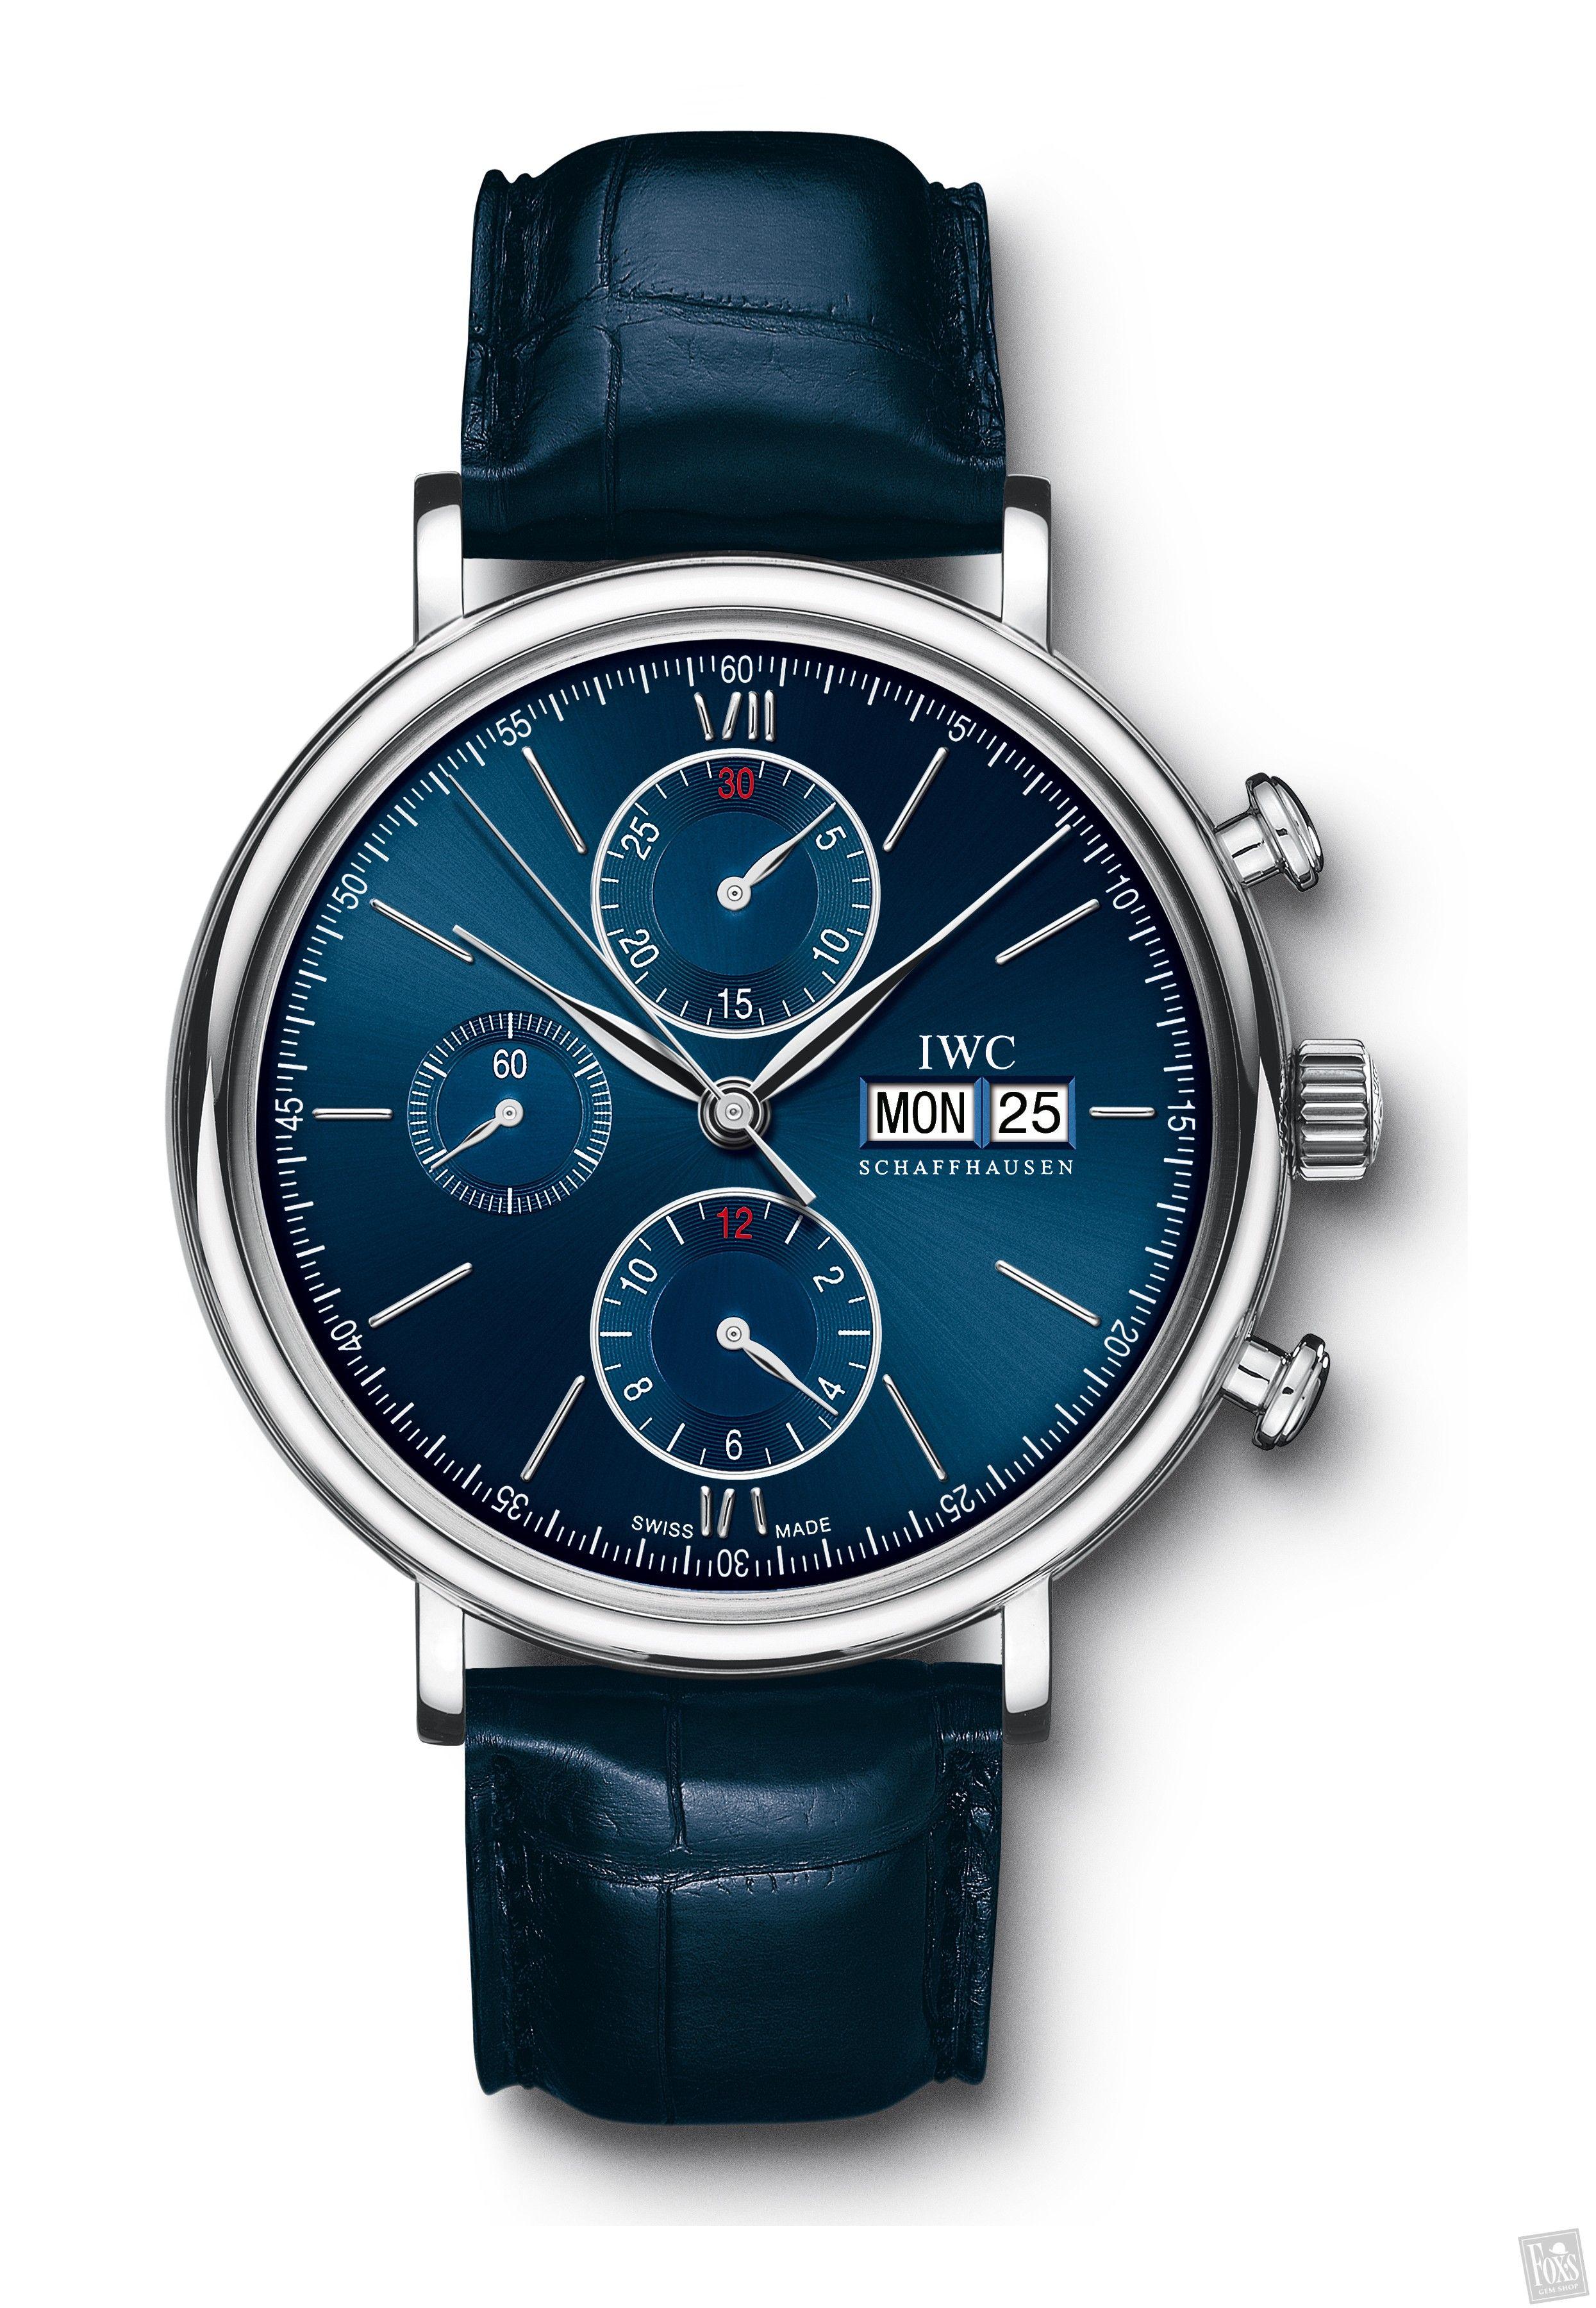 Iwc Portofino Chrono Ed Laureus Sport For Good Fndn Iw391019 Luxury Watches For Men Watches For Men Best Watches For Men